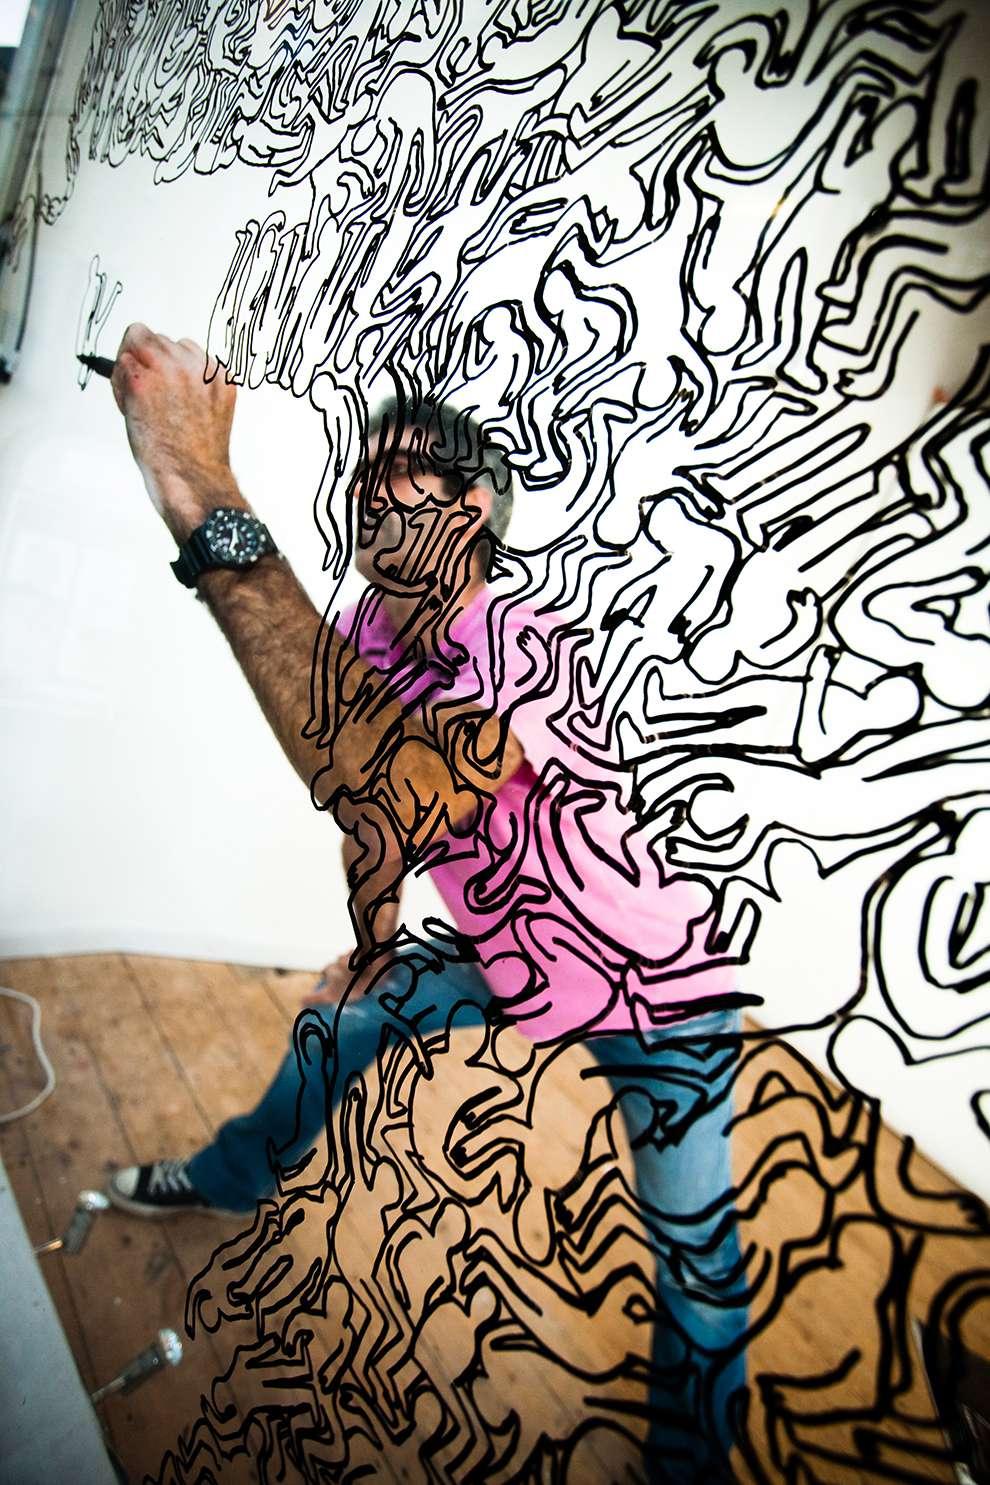 Simon Spilsbury, Line art illustration, live drawing event